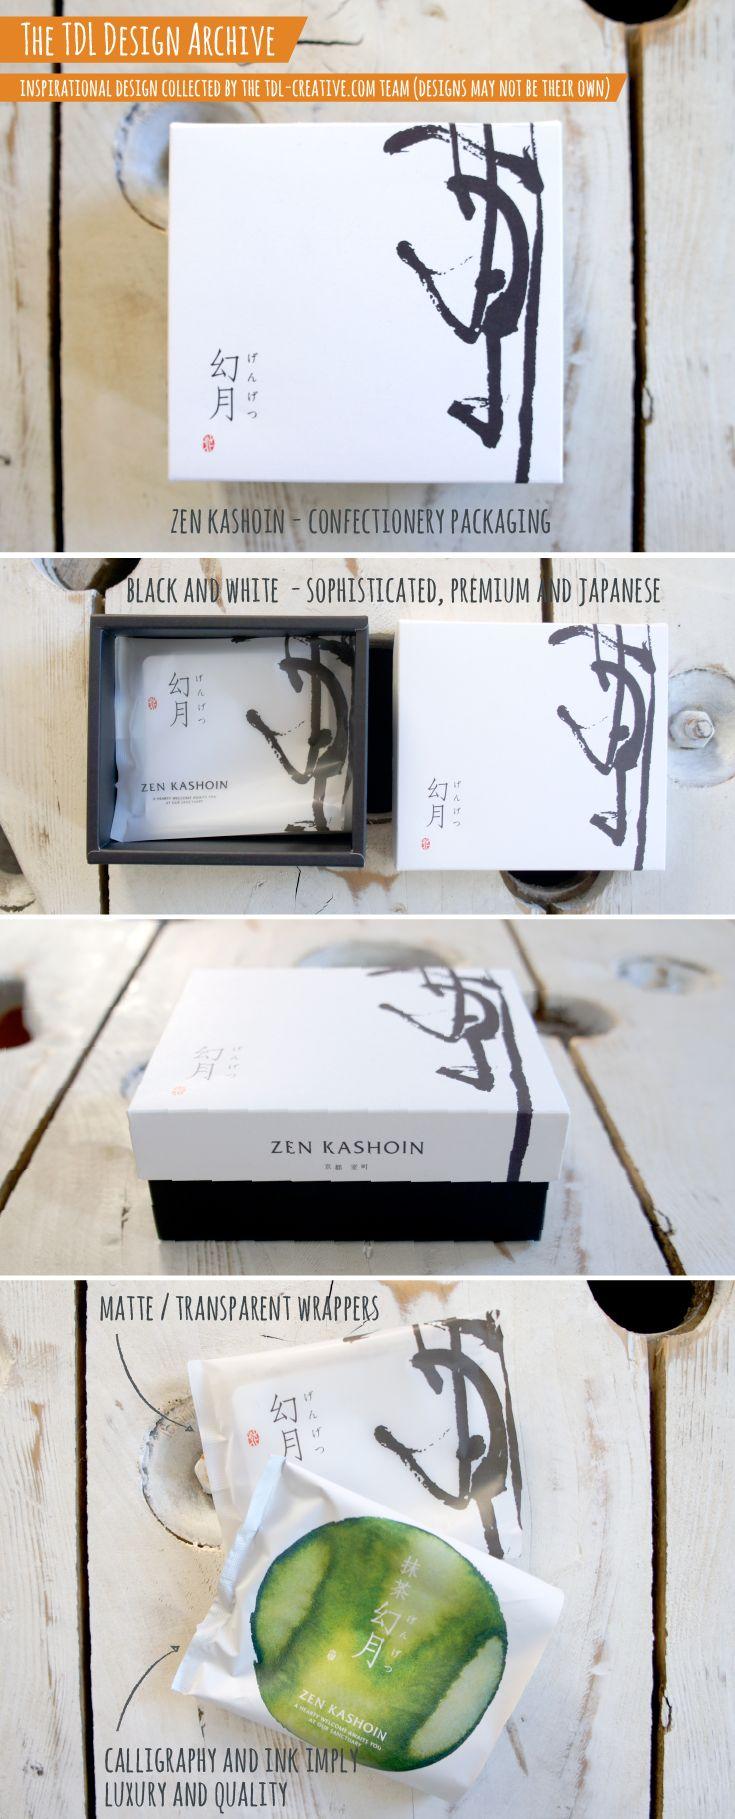 Zen Kashoin - Confectionery Packaging